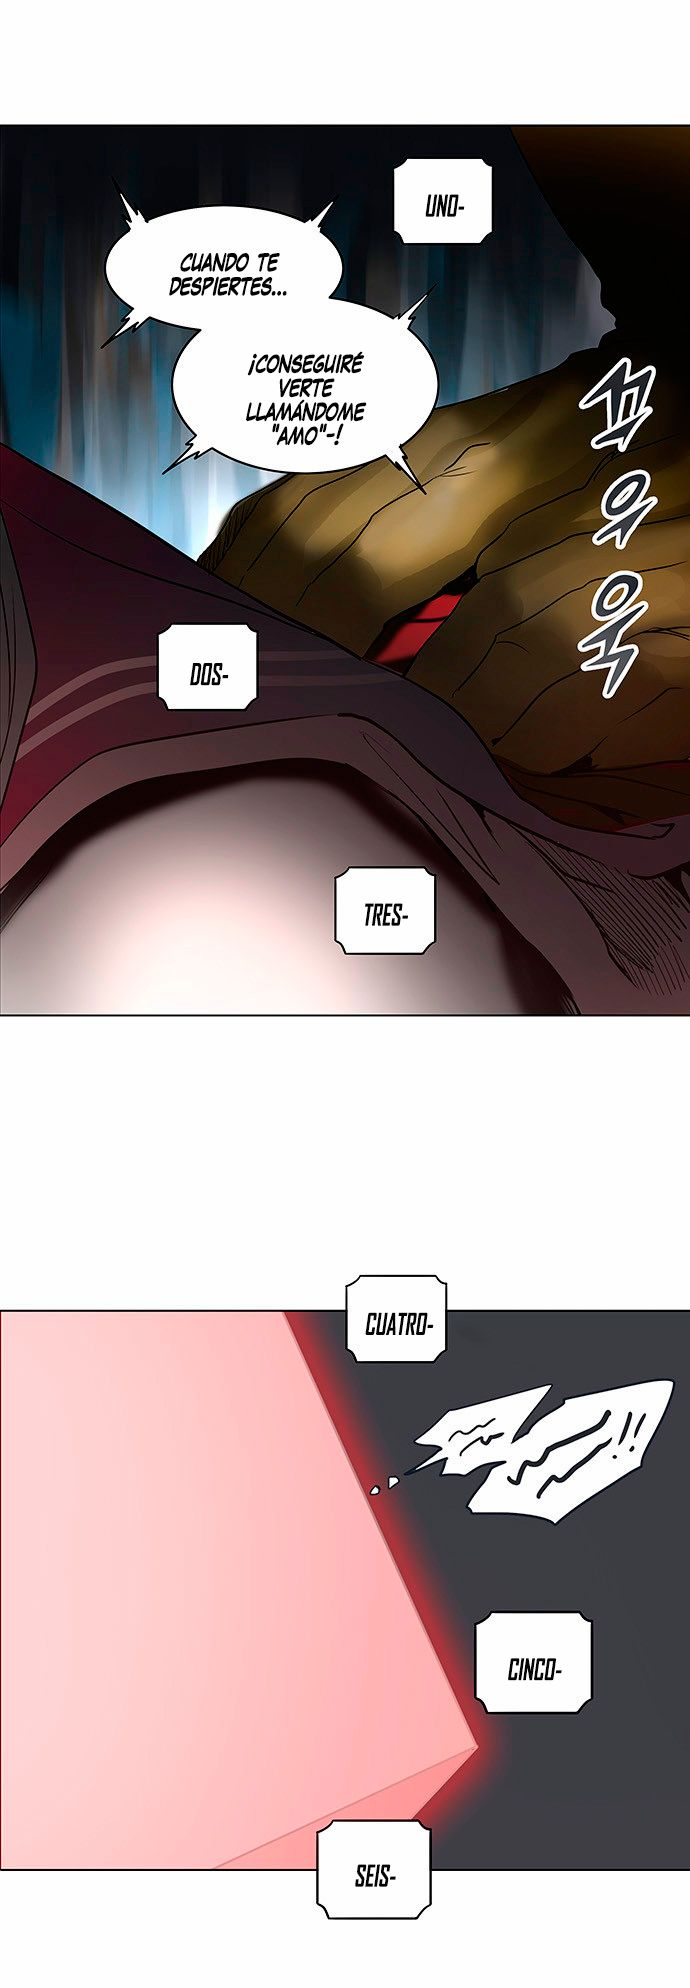 https://c5.ninemanga.com/es_manga/21/149/467427/348ff59ec3c07fe84960f63a167d58f9.jpg Page 63